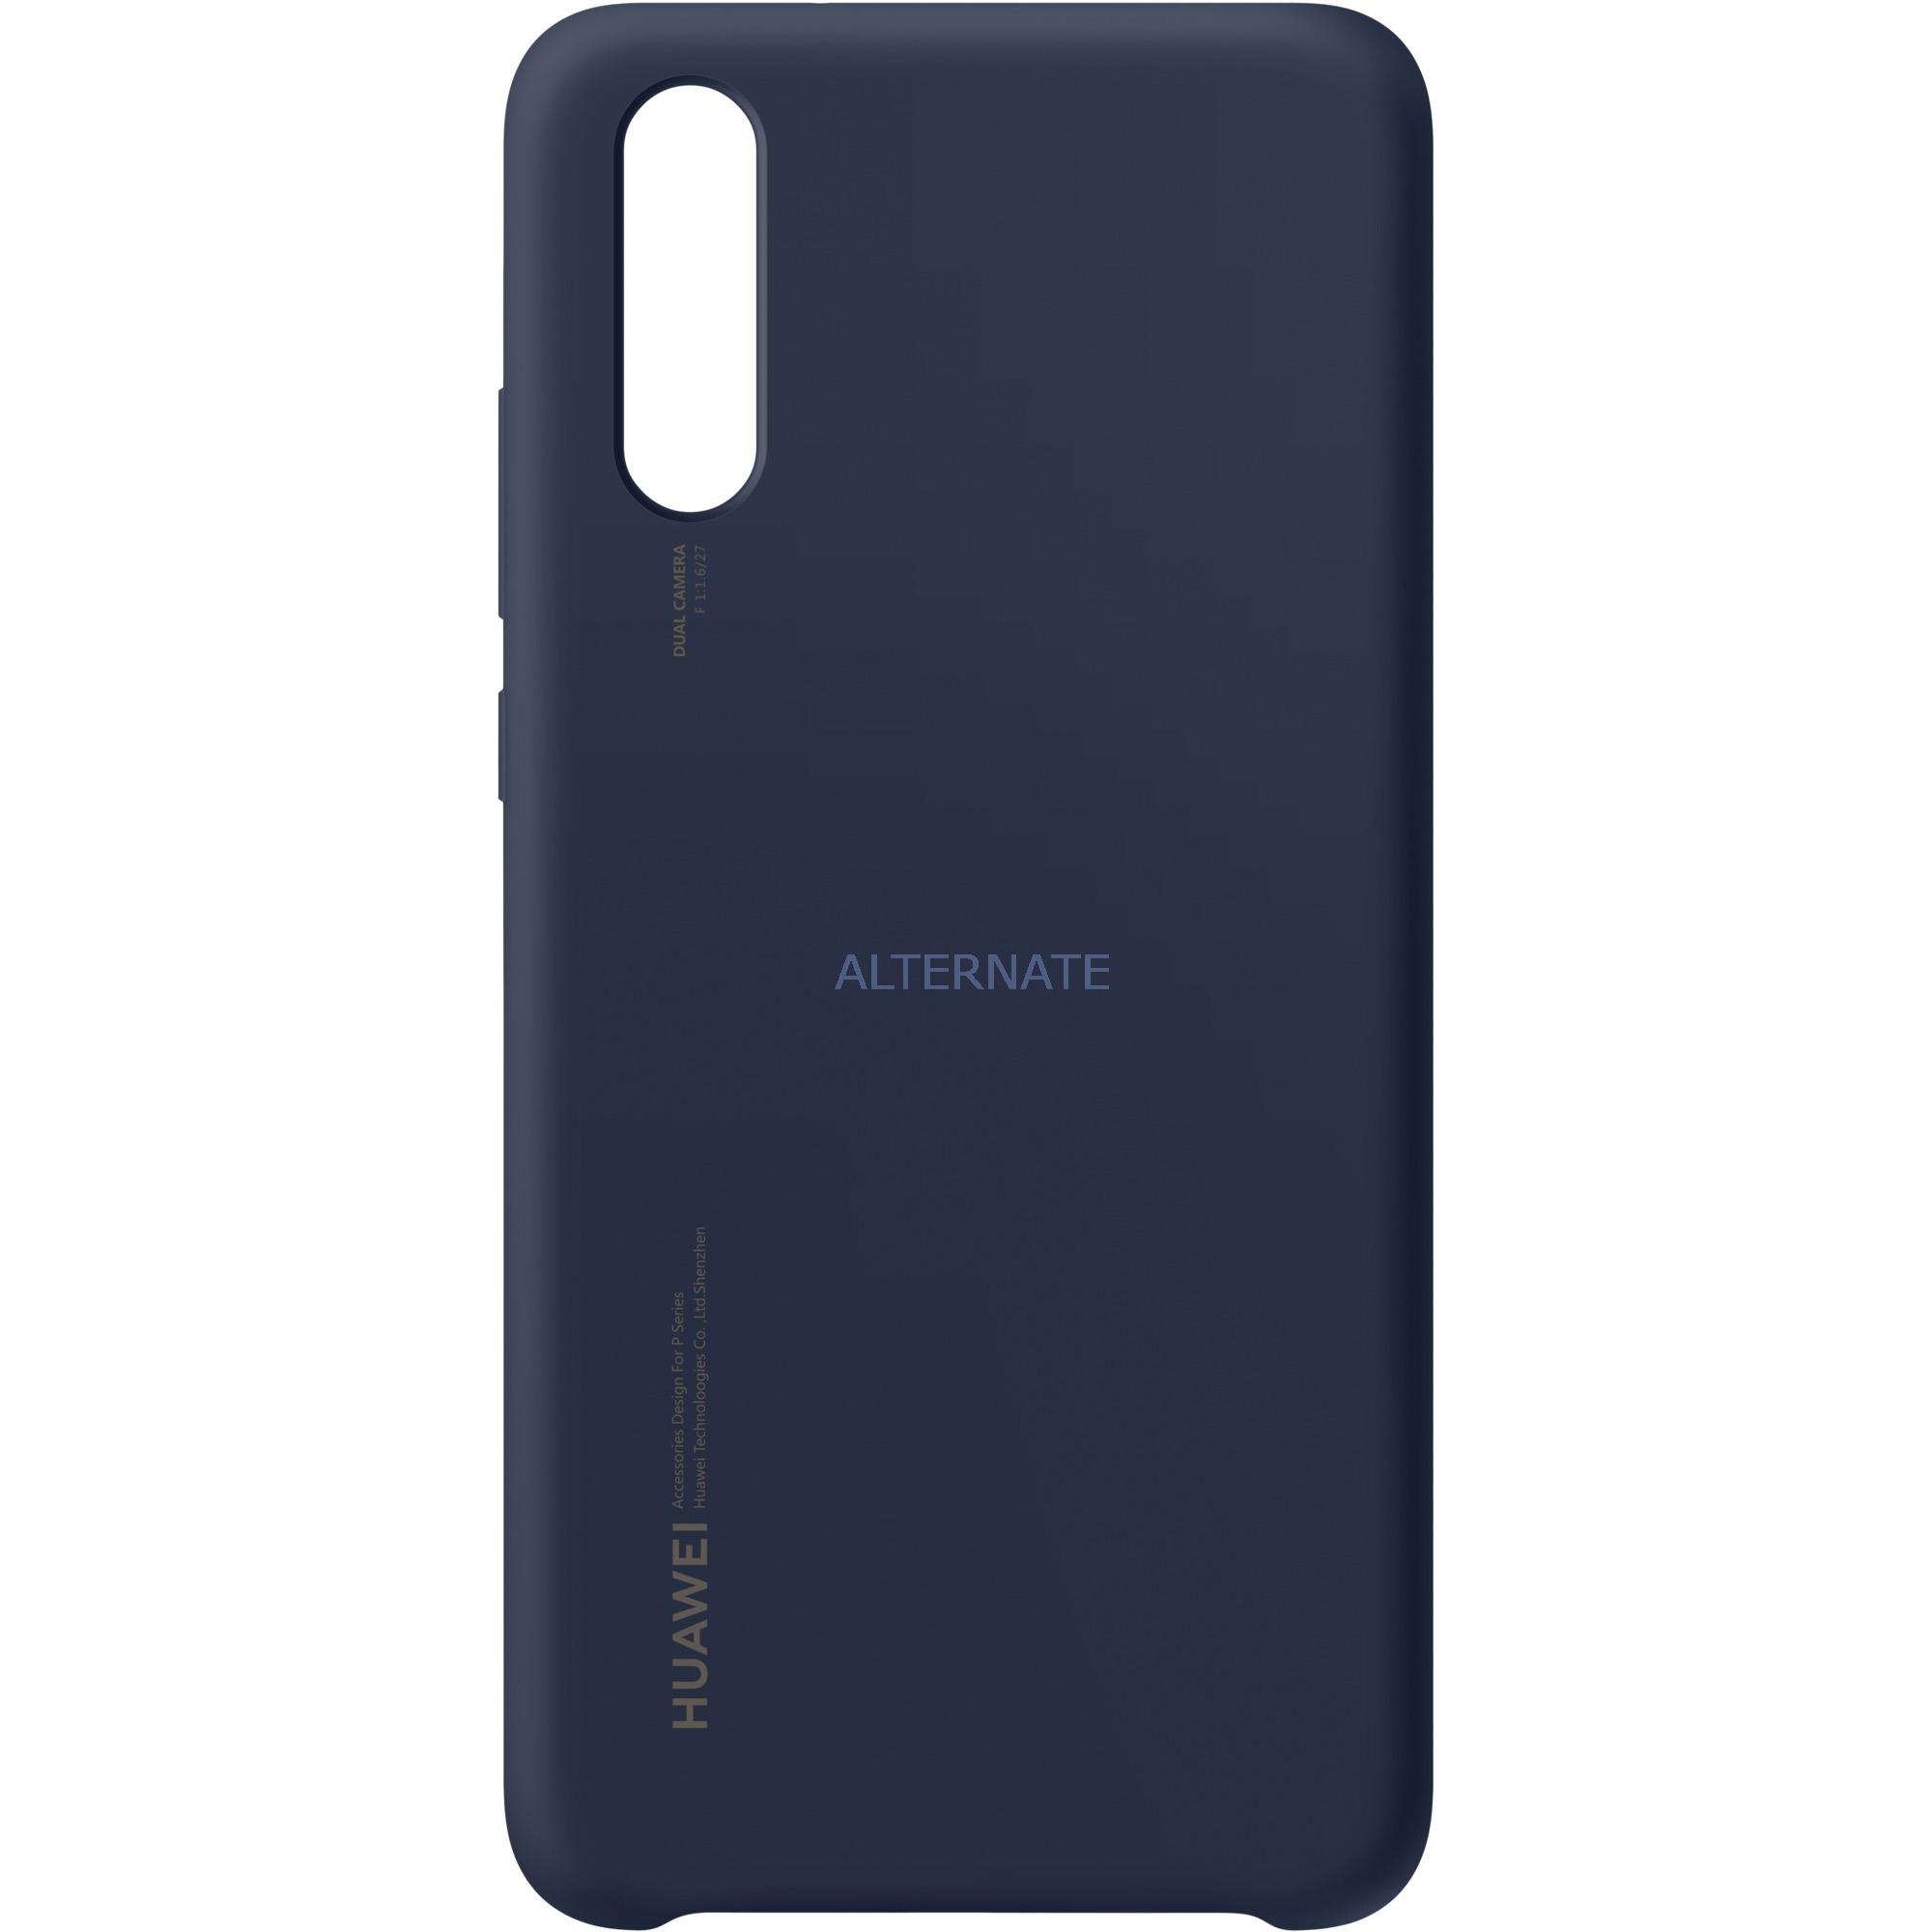 "Silicon Case funda para teléfono móvil 14,7 cm (5.8"") Azul, Funda protectora"